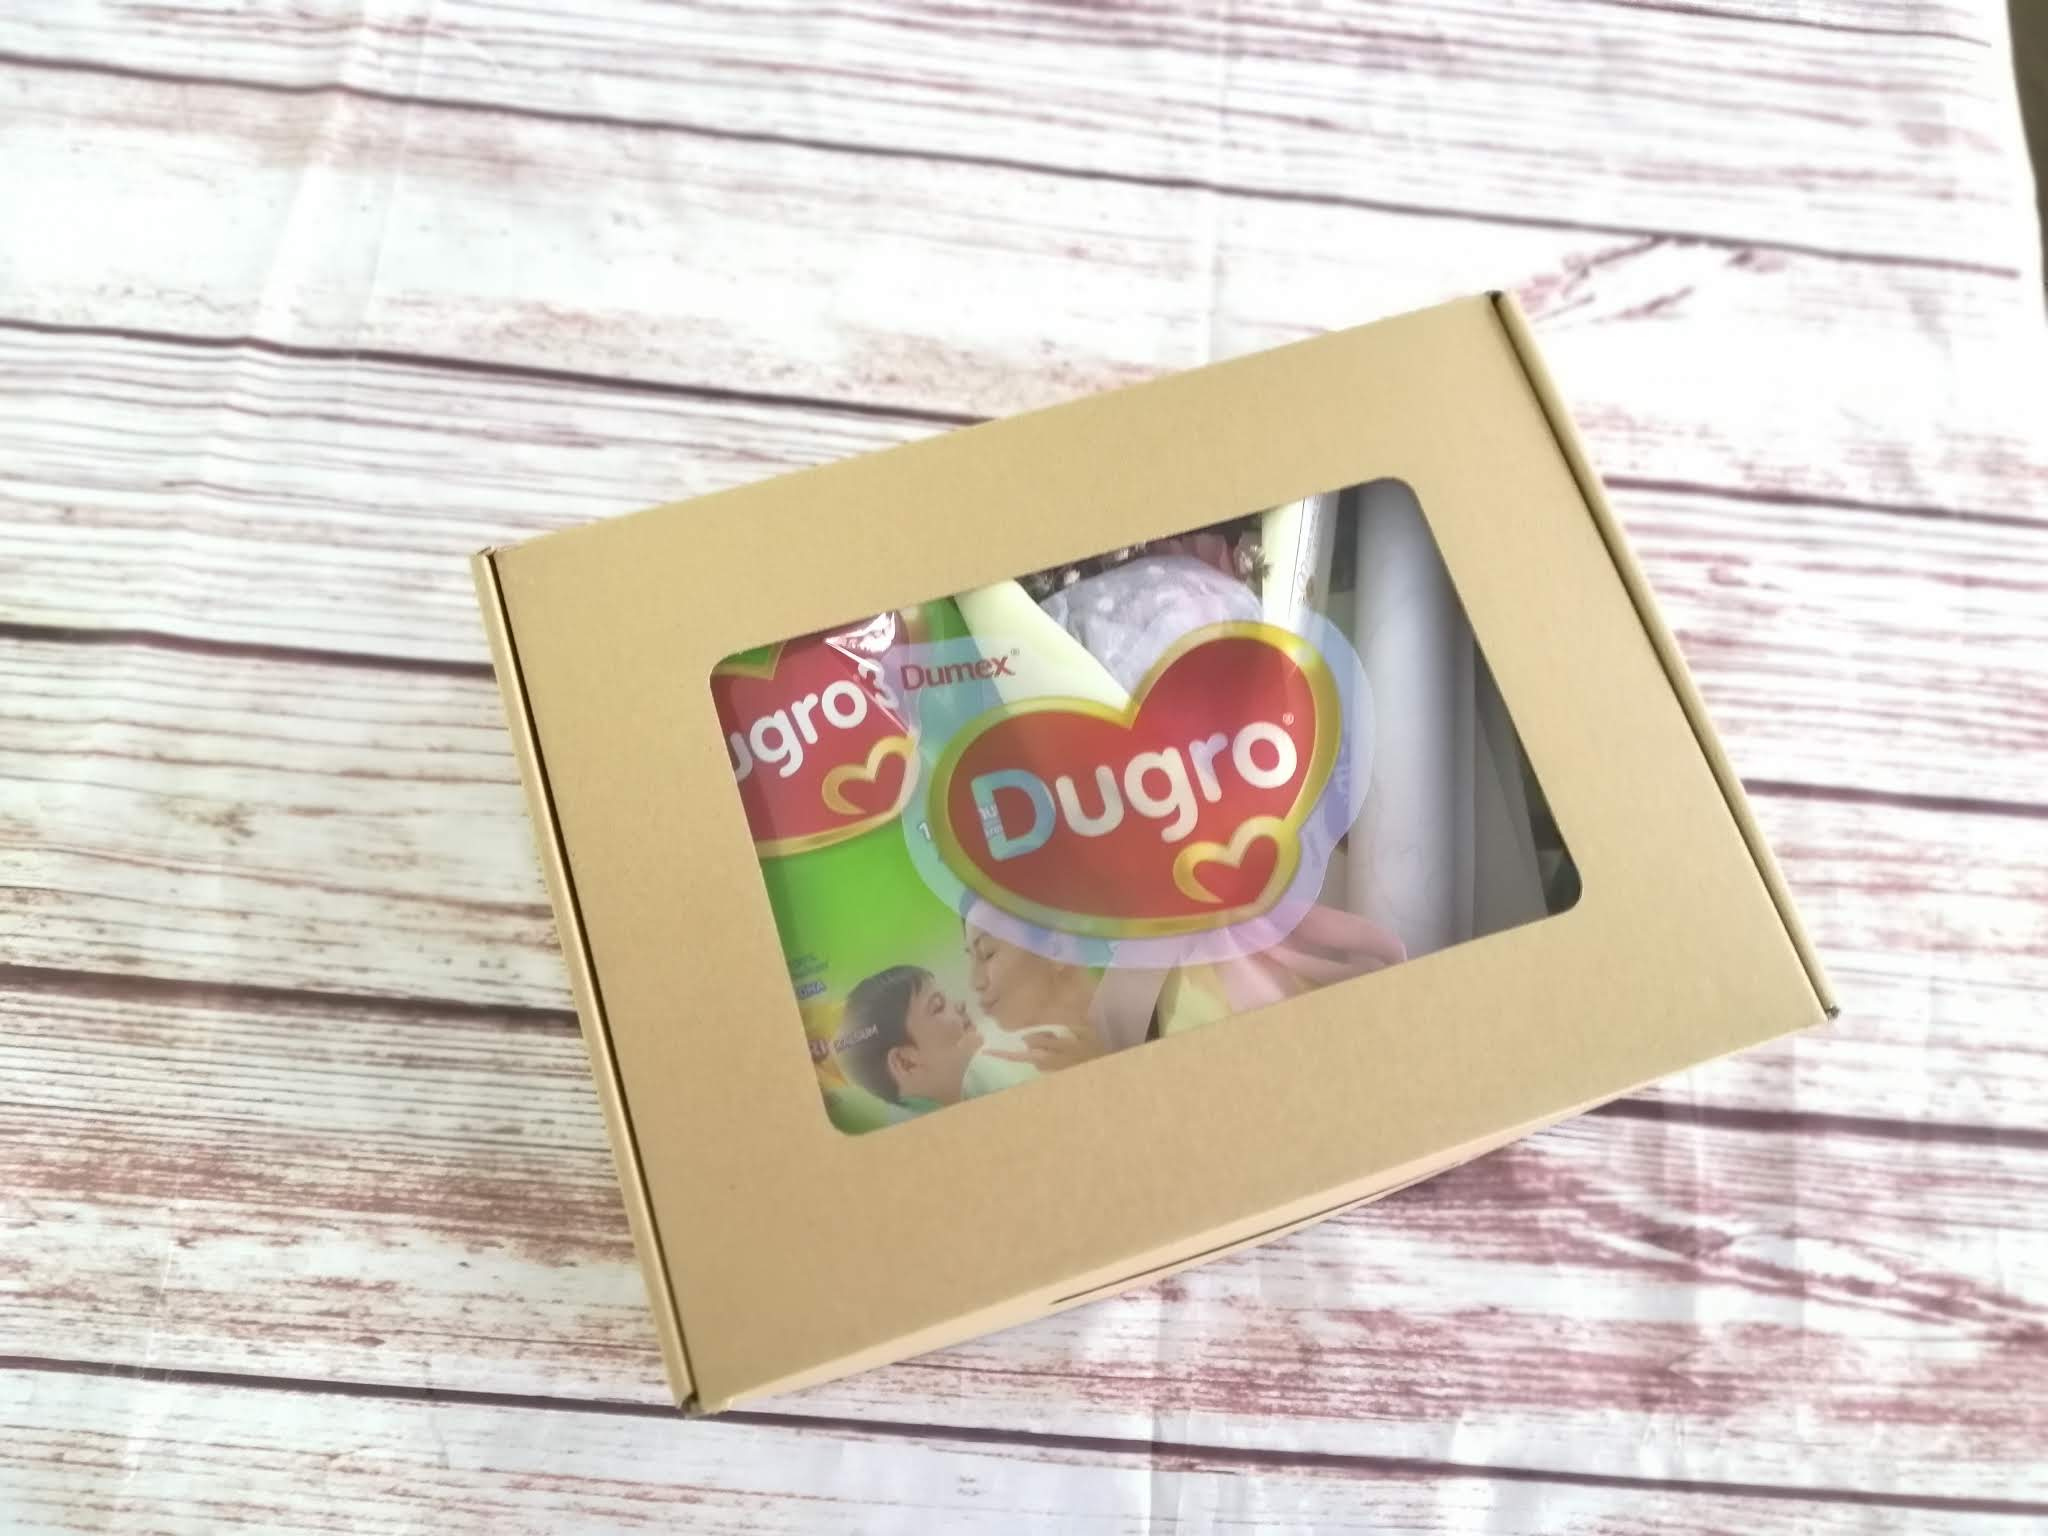 Dumex Dugro,Danone Dumex,susu dugro bahaya ke,susu dumex dugro 0 - 12 bulan,dugro sample,dumex dugro price,susu dugro 0 - 12 bulan